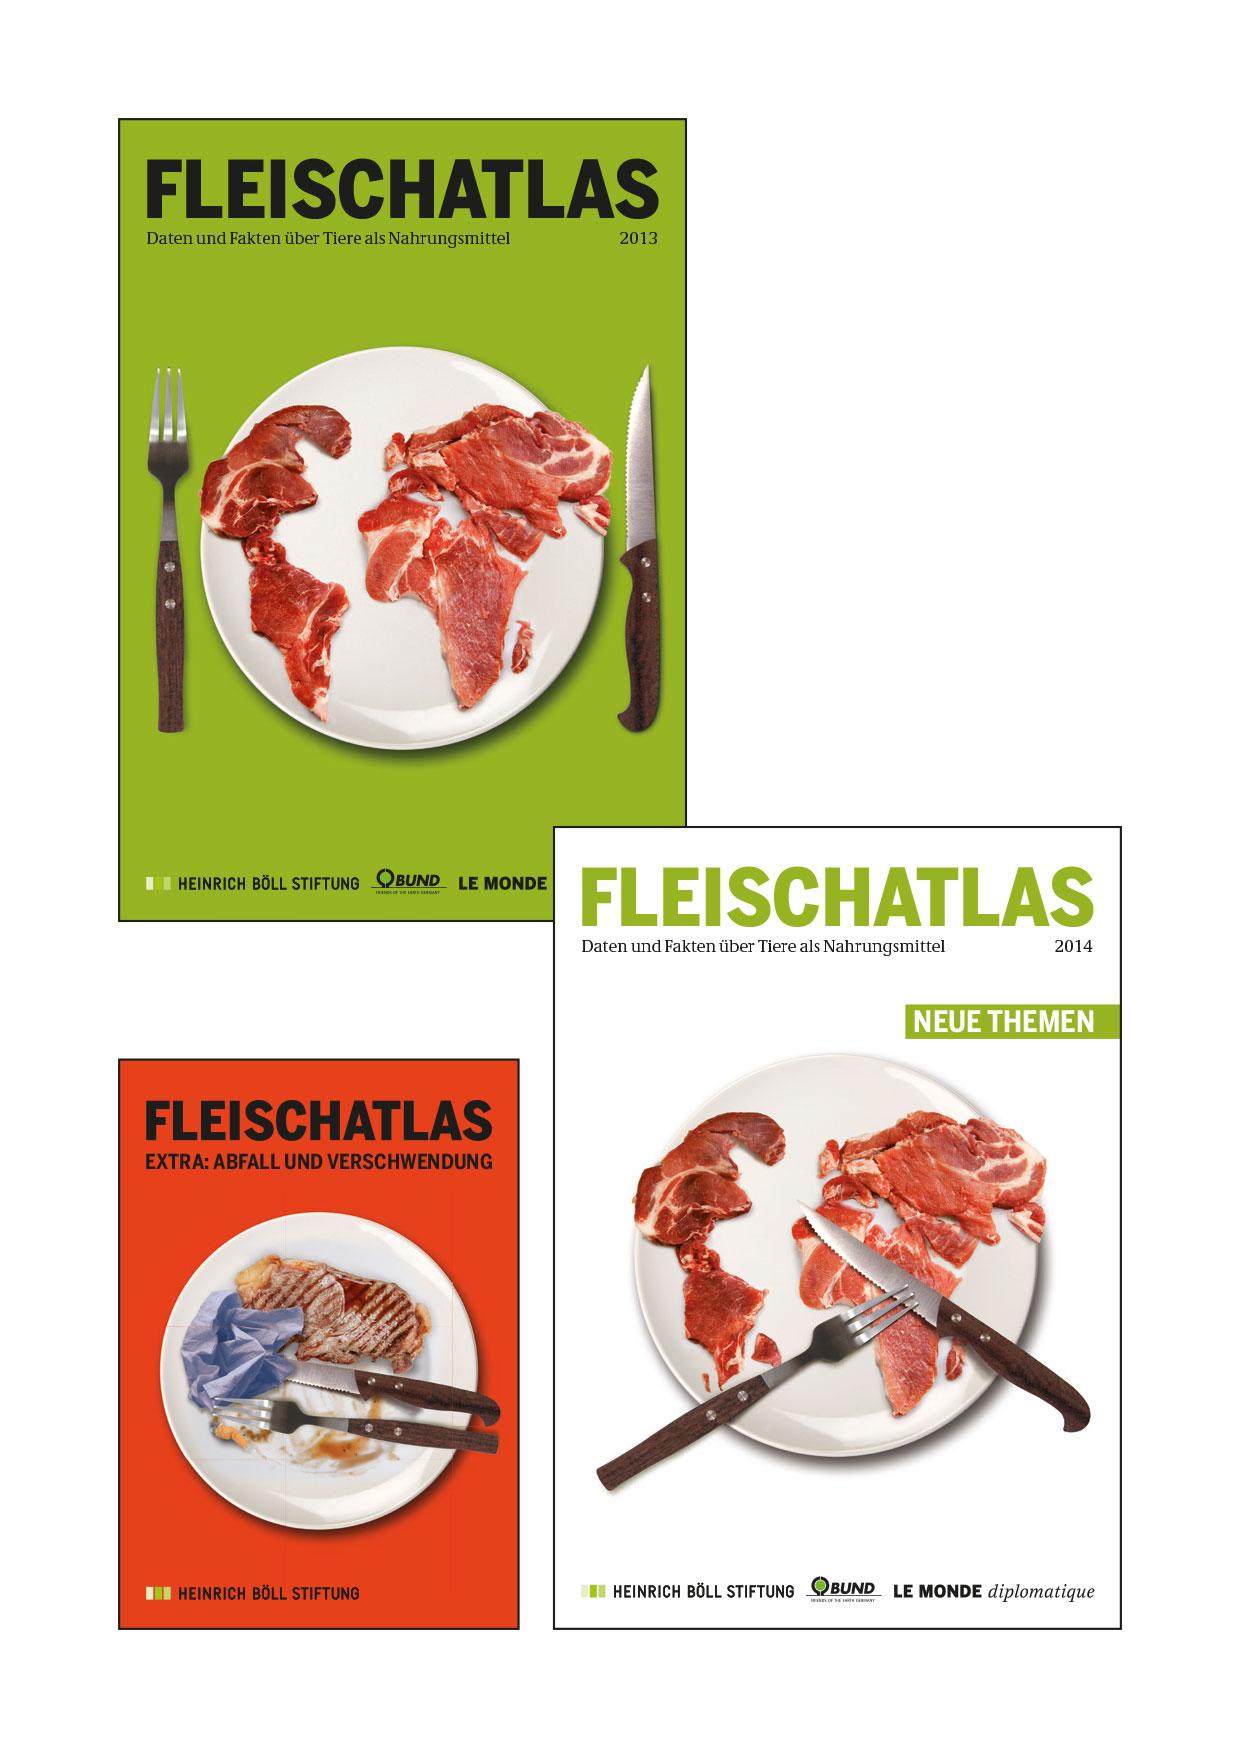 Fleischatlas 2014